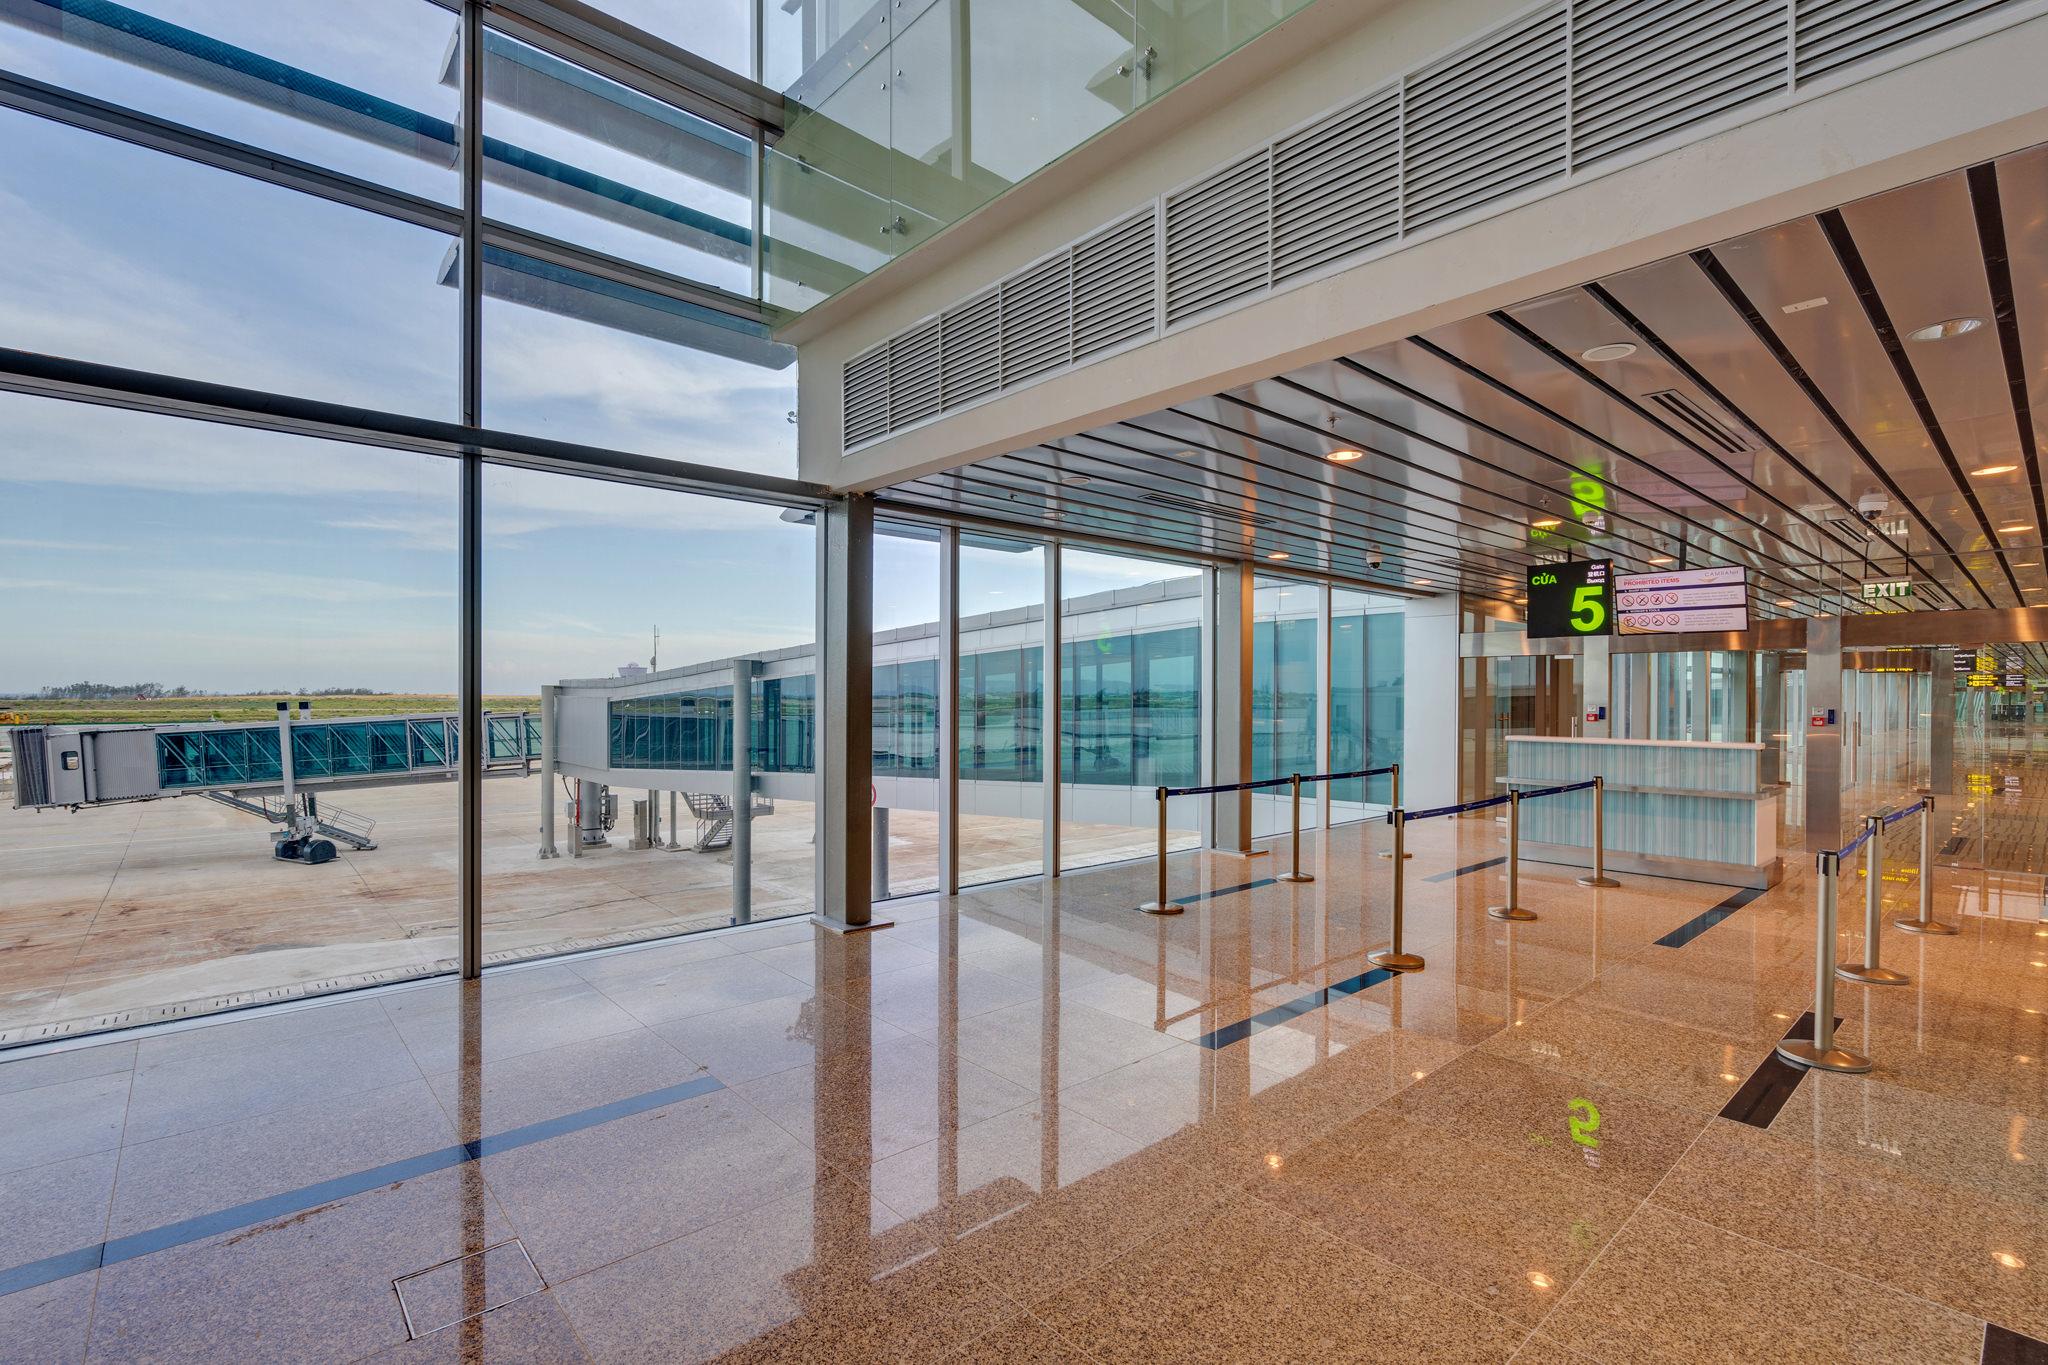 20180626 - Cam Ranh Airport - Architecture - 0352.jpg